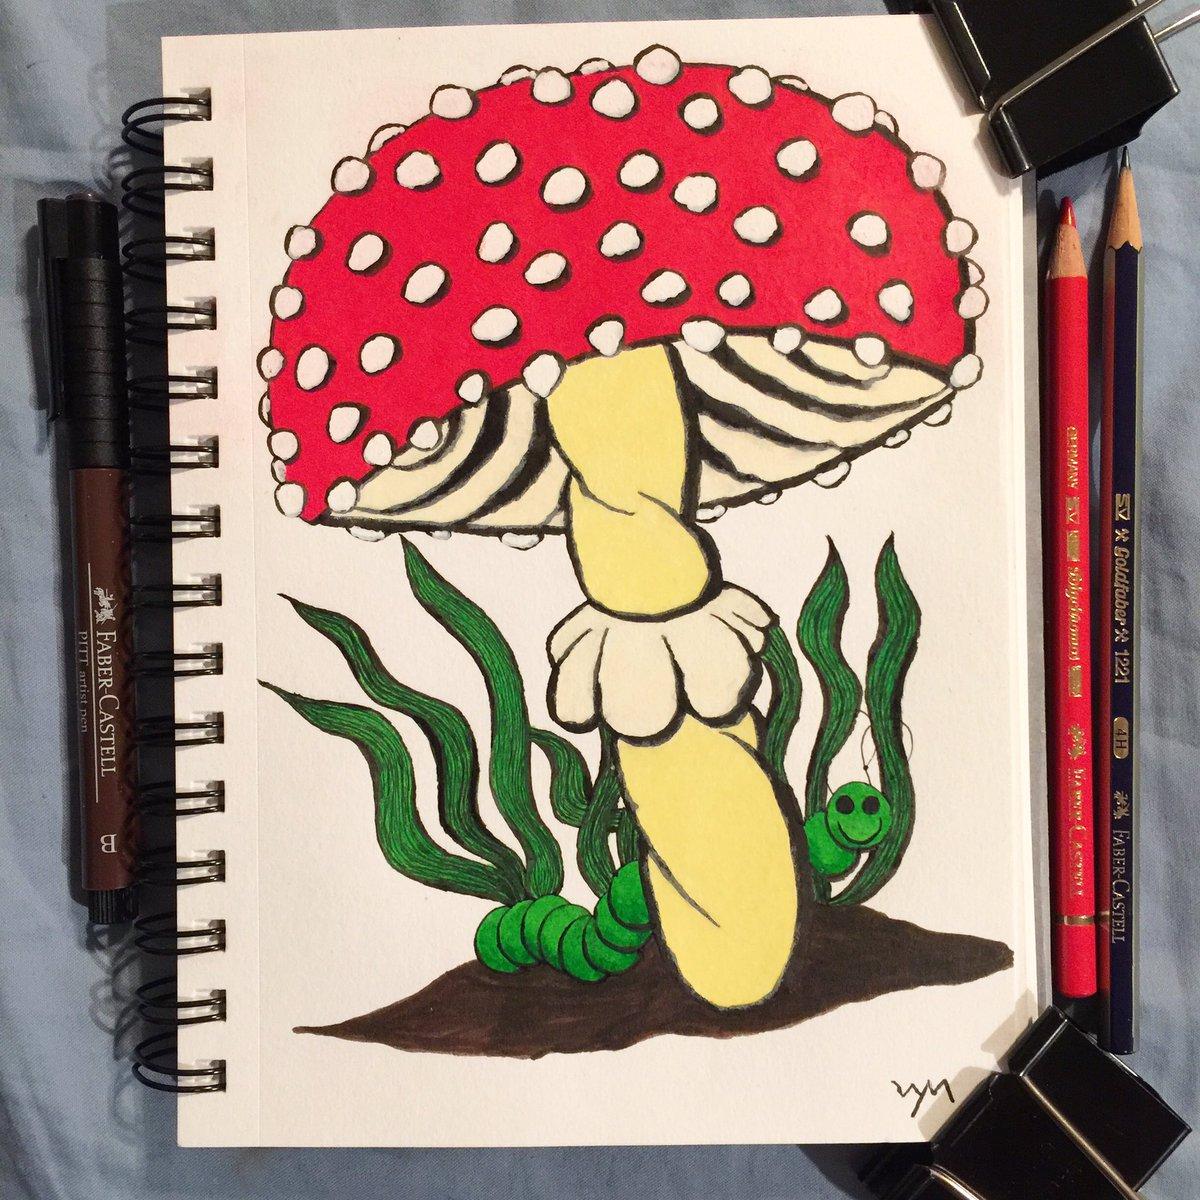 #wynart #InchWormofHappiness #fungi #mushroom #art #traditionalart #traditionaldrawing #drawing #coloredpencils #penandink #fabercastell #beepapercompanypic.twitter.com/gTN5RI1EEq